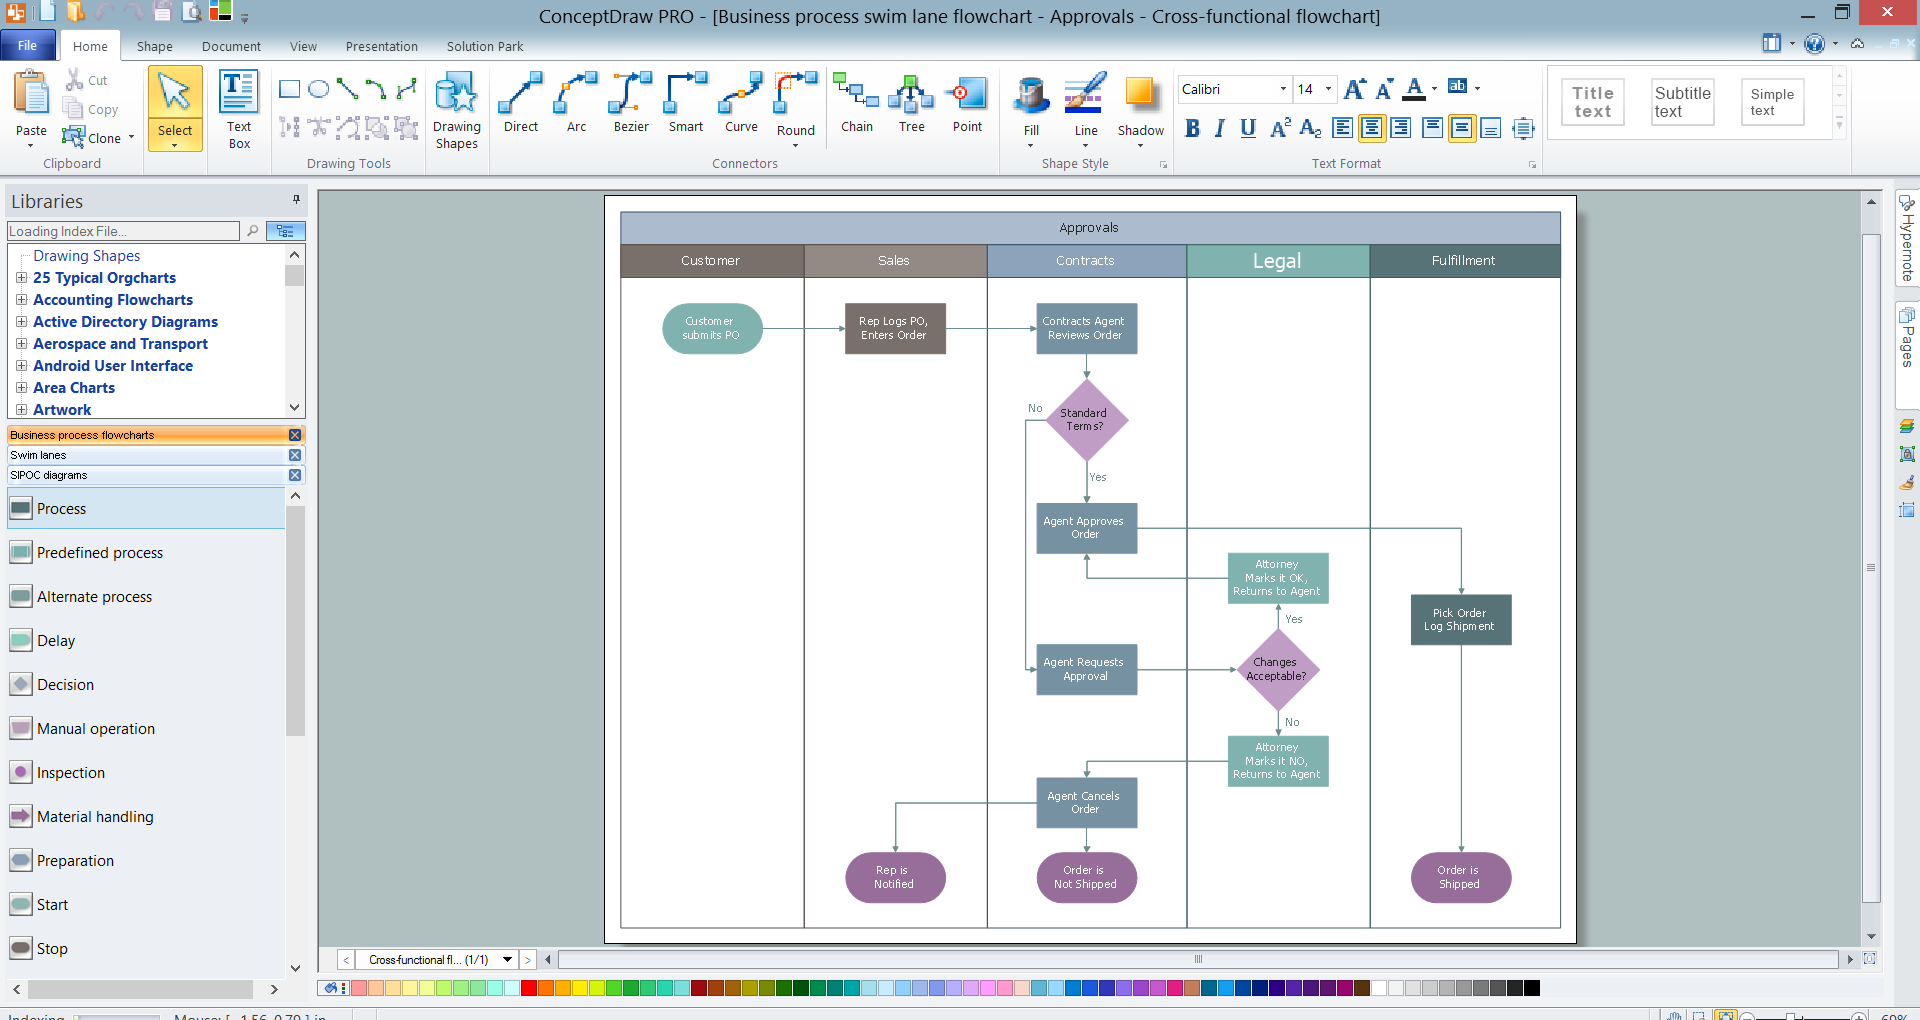 Samples Of Swim Lane Process Map Template Excel And Swim Lane Process Map Template Excel Letter